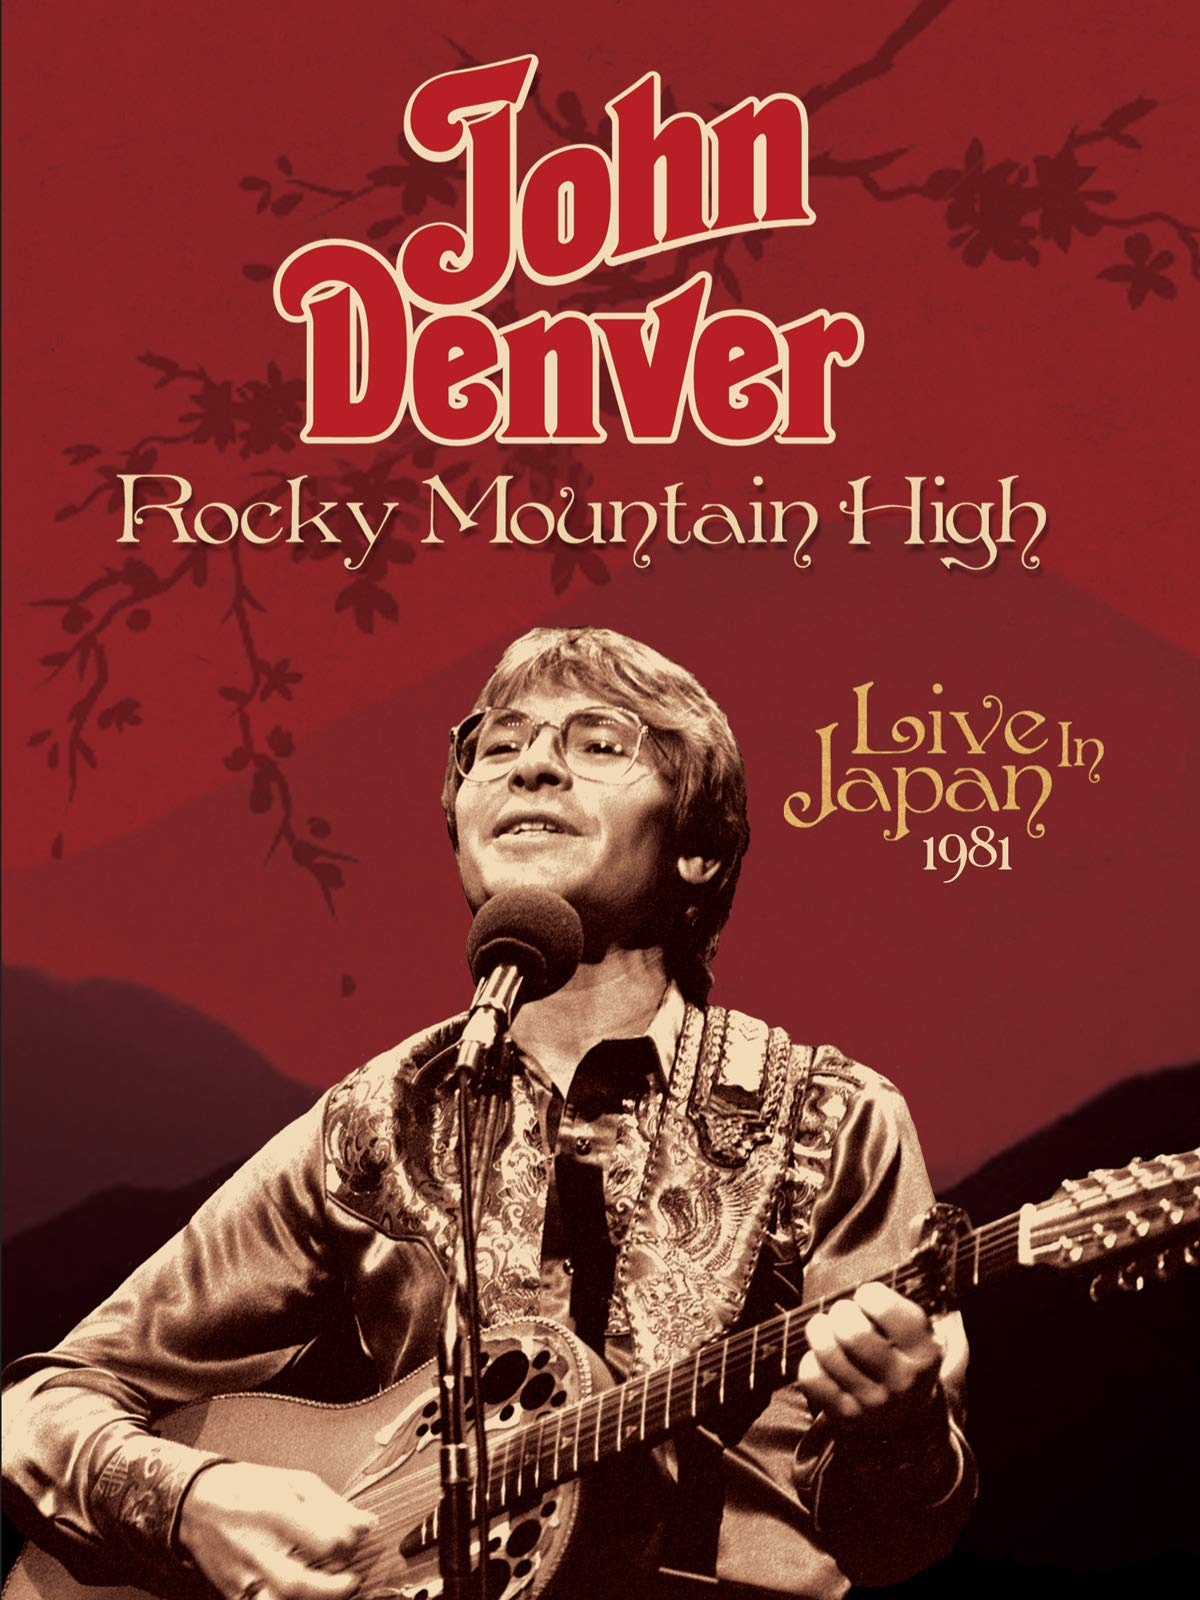 John Denver - Rocky Mountain High Live In Japan 1981 on Amazon Prime Video UK